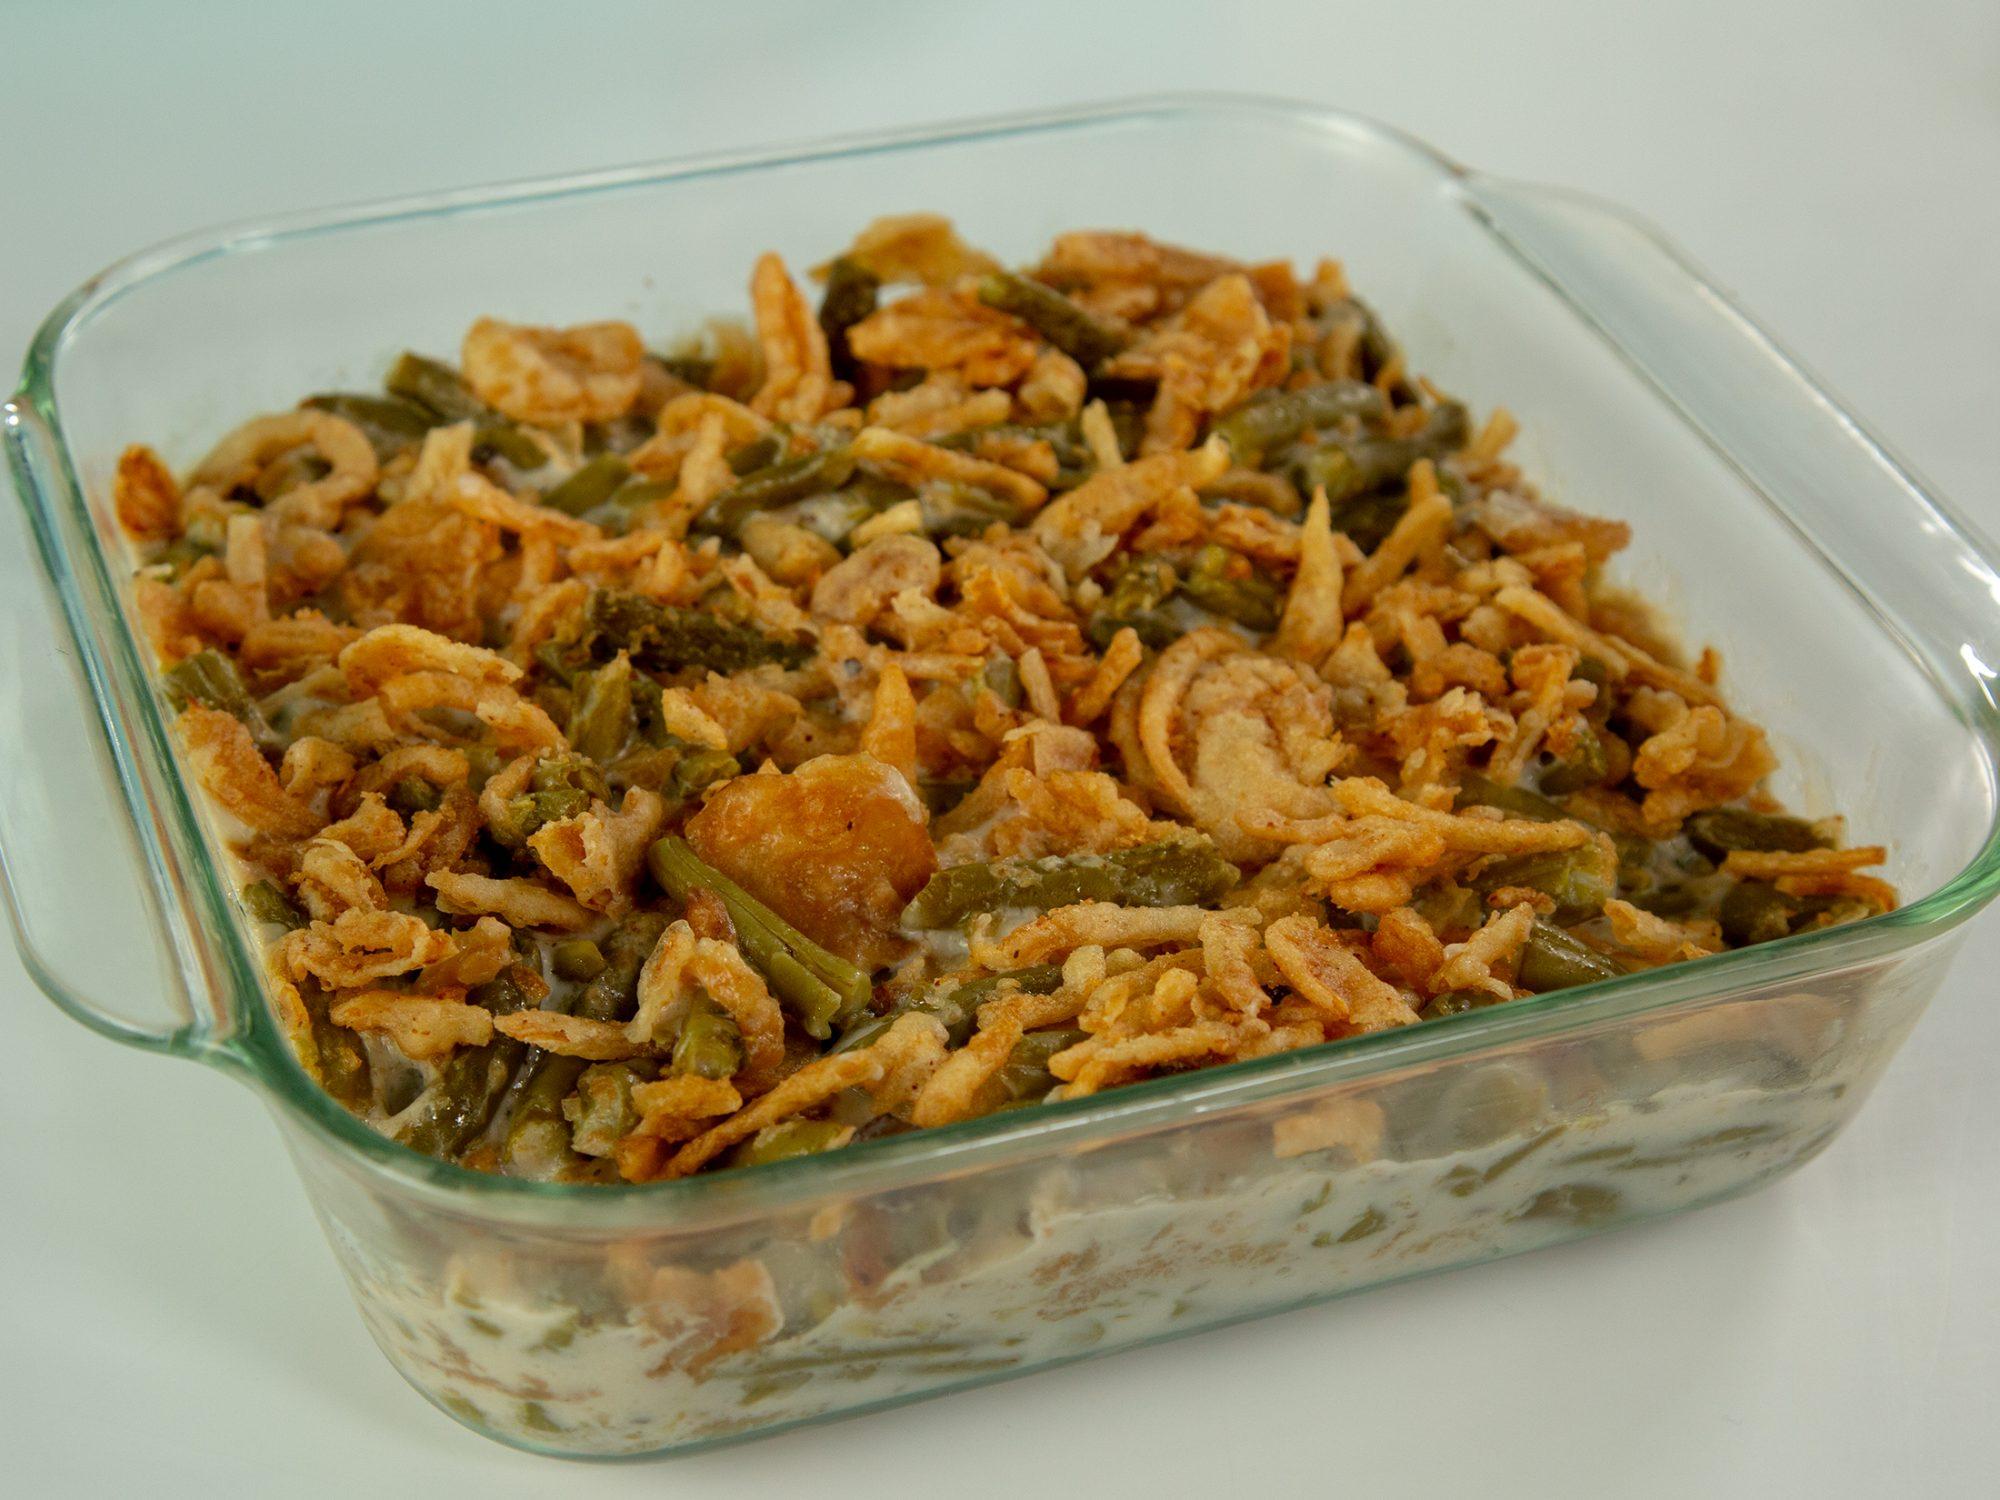 Microwave Green Bean Casserole image